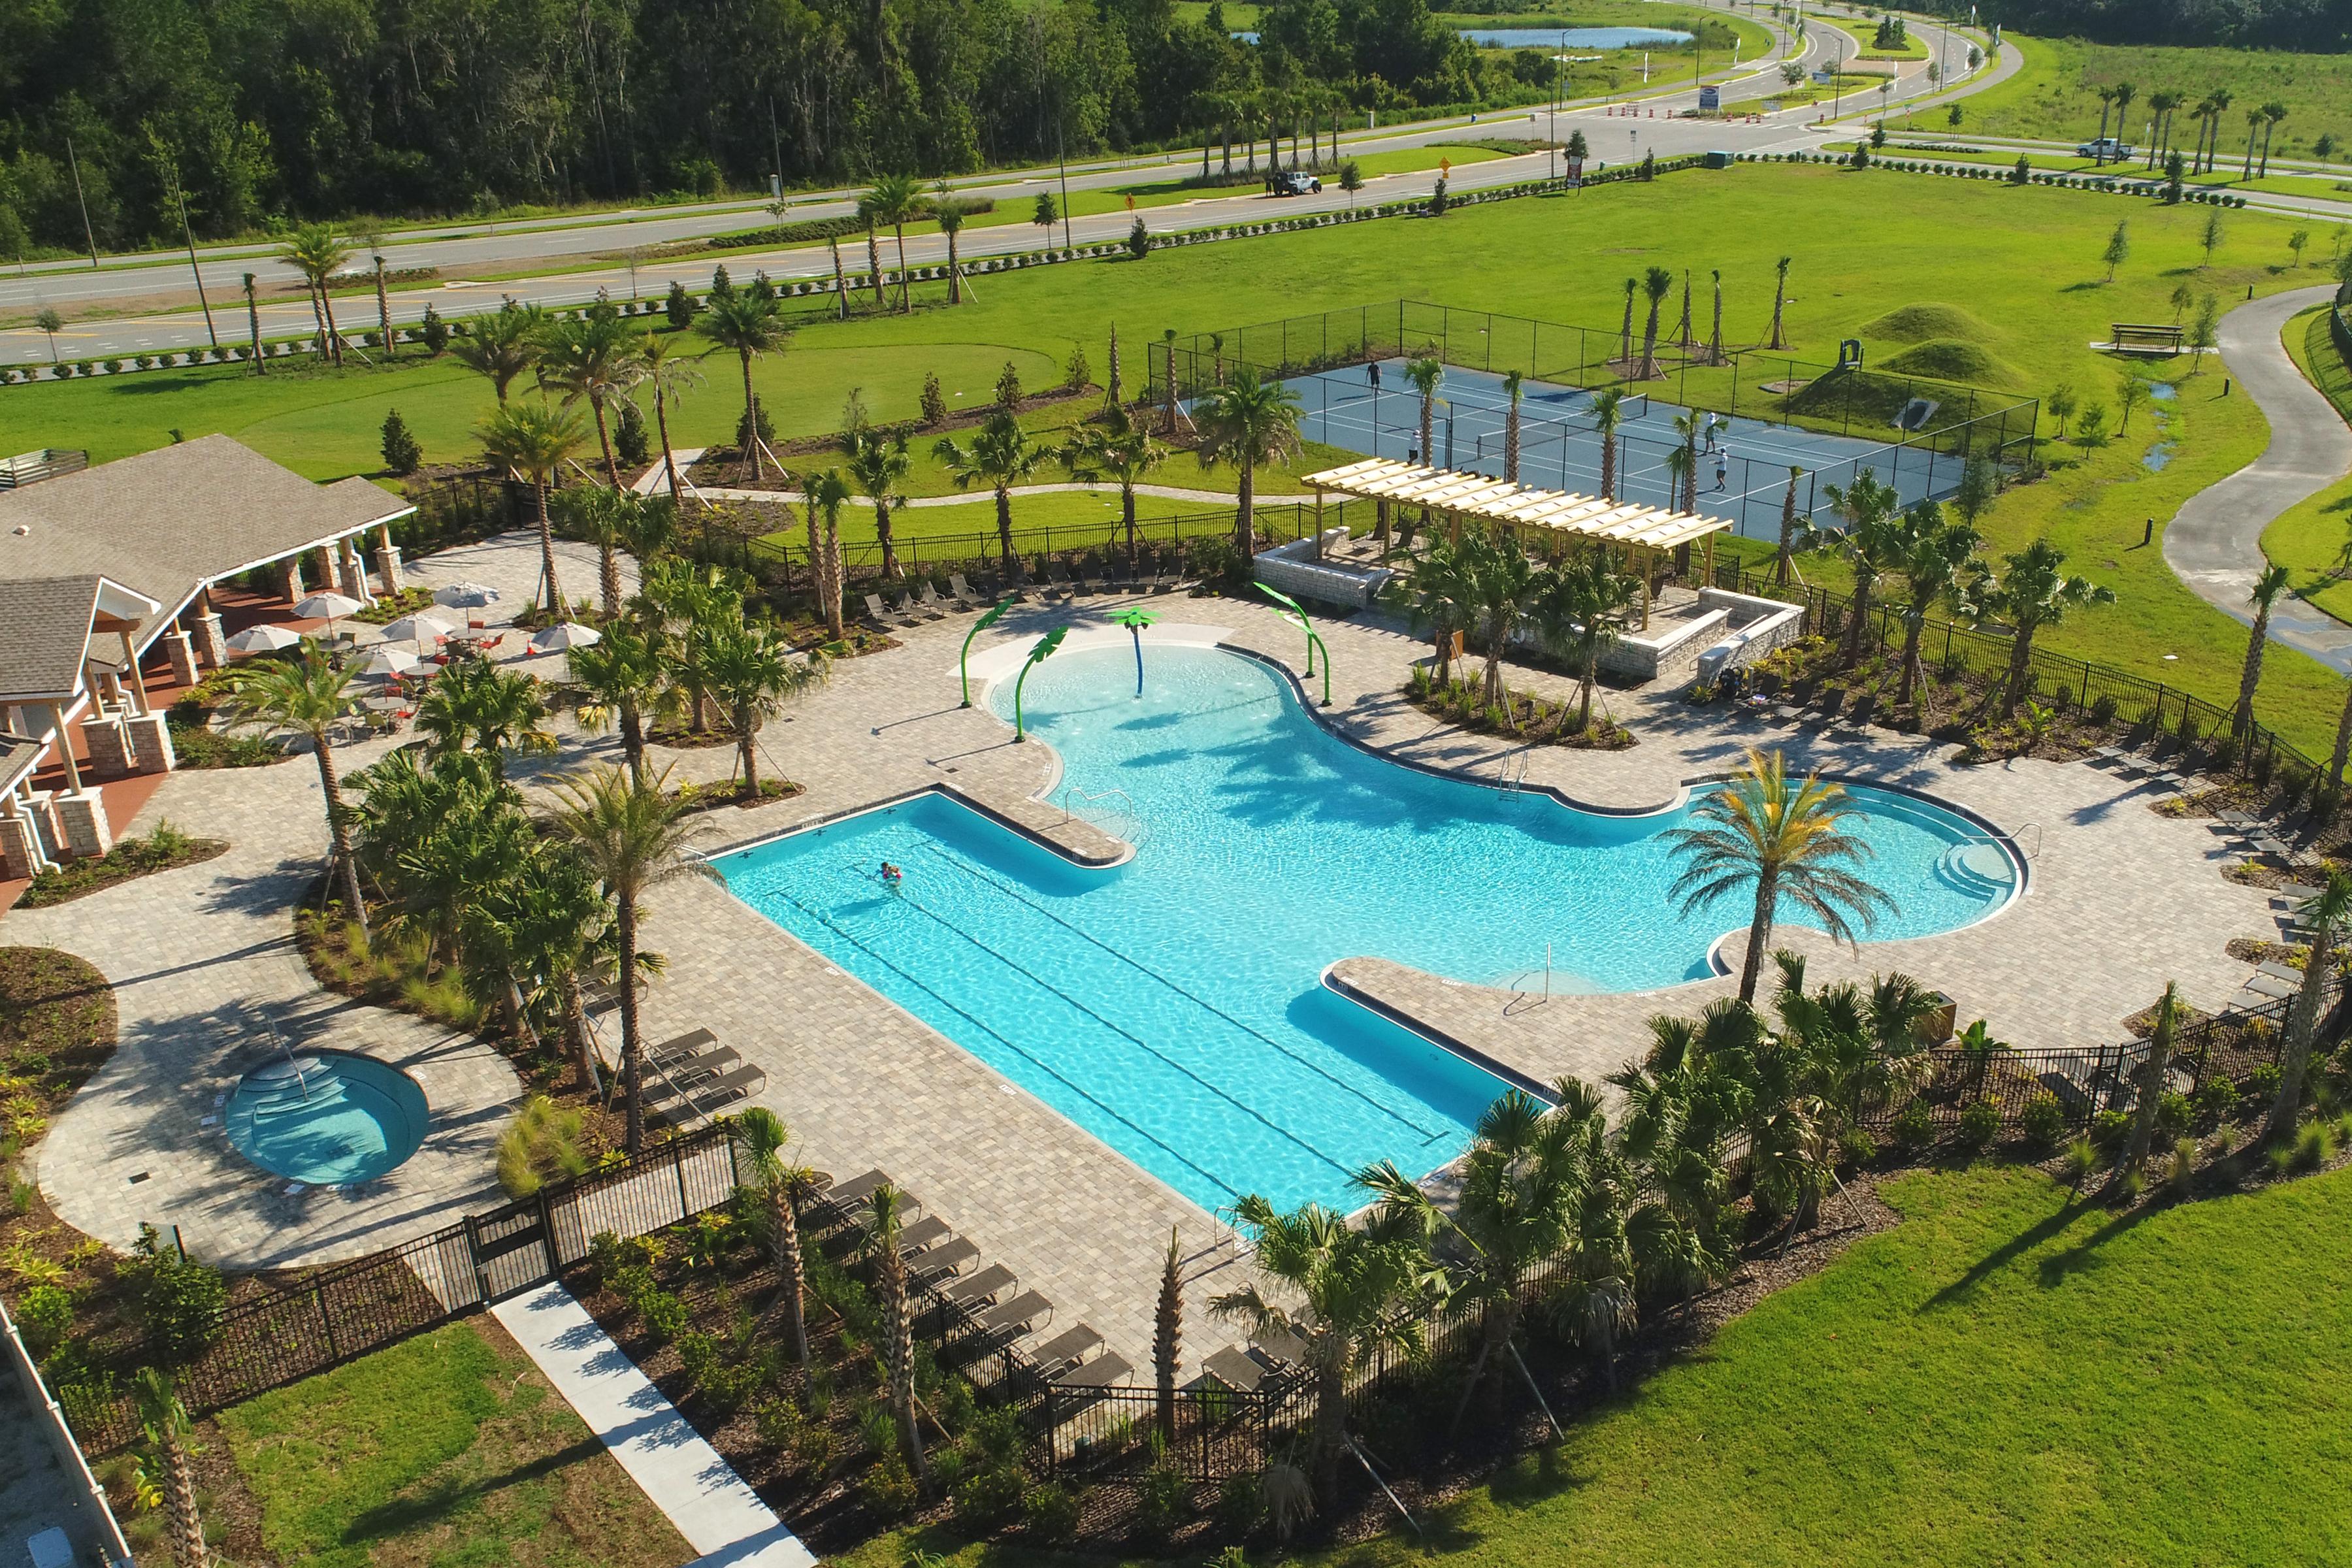 Storey Park Pool